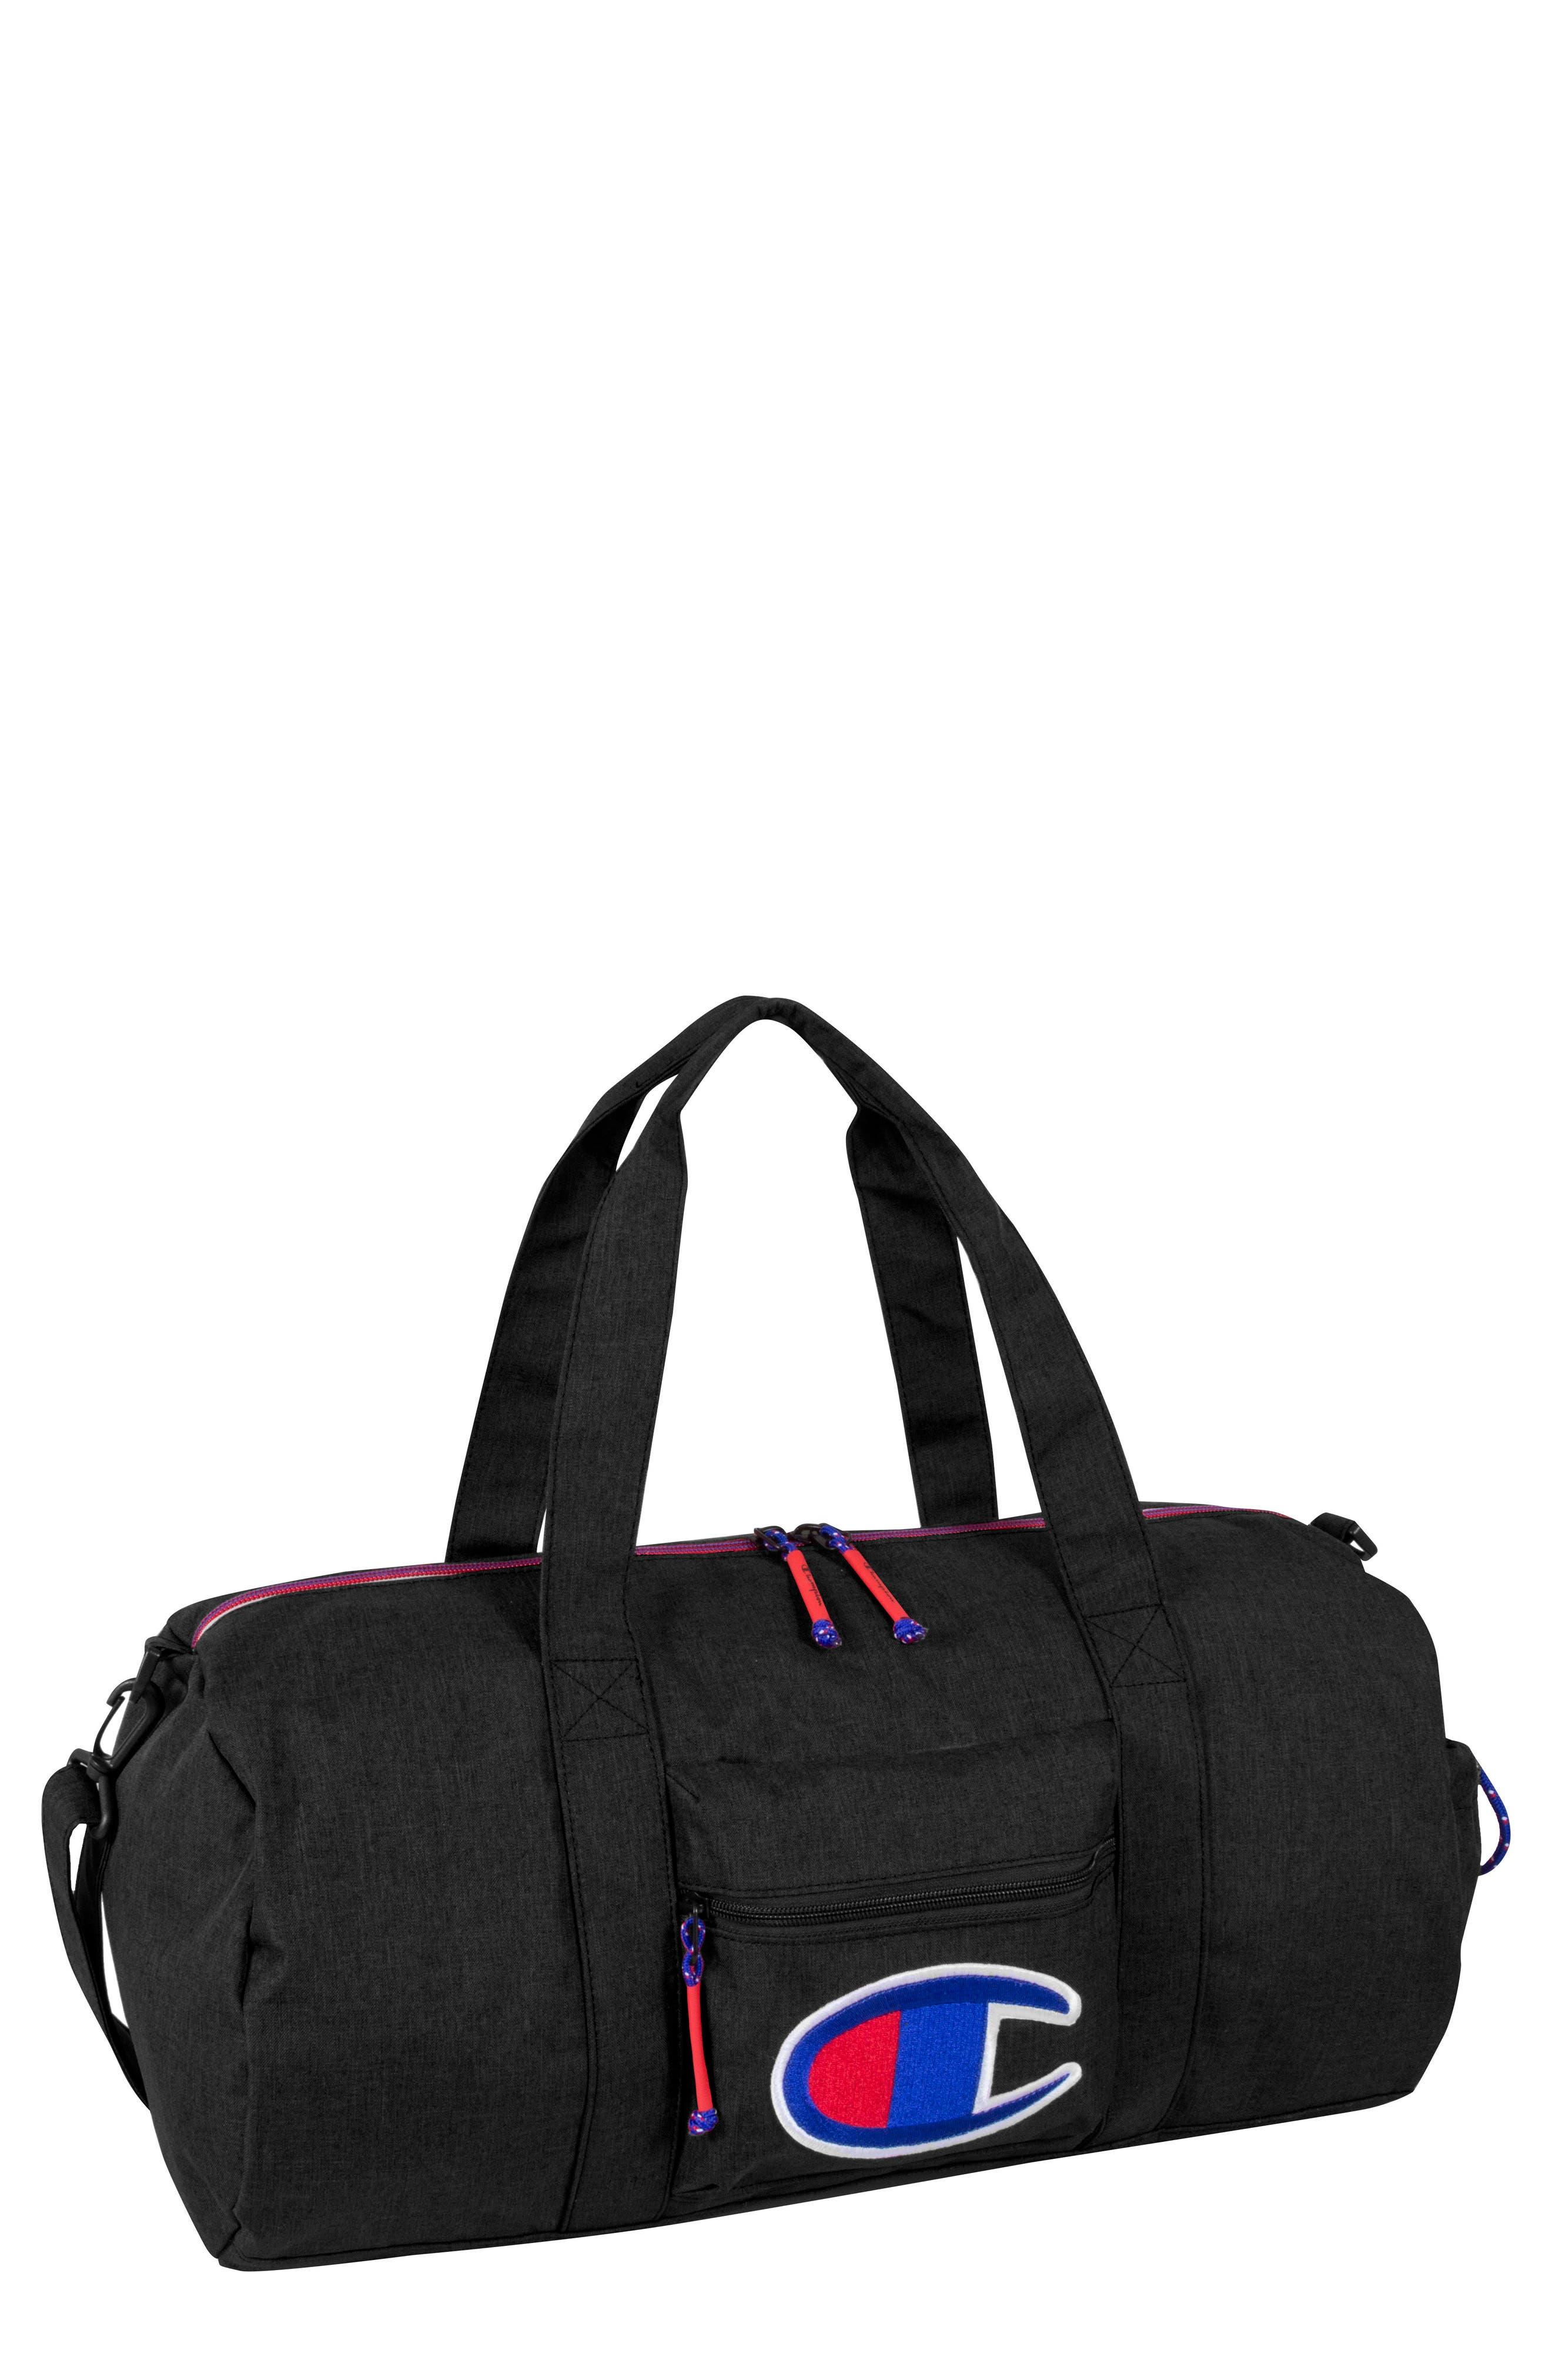 Barrel Duffel Bag,                             Main thumbnail 1, color,                             Black Heather